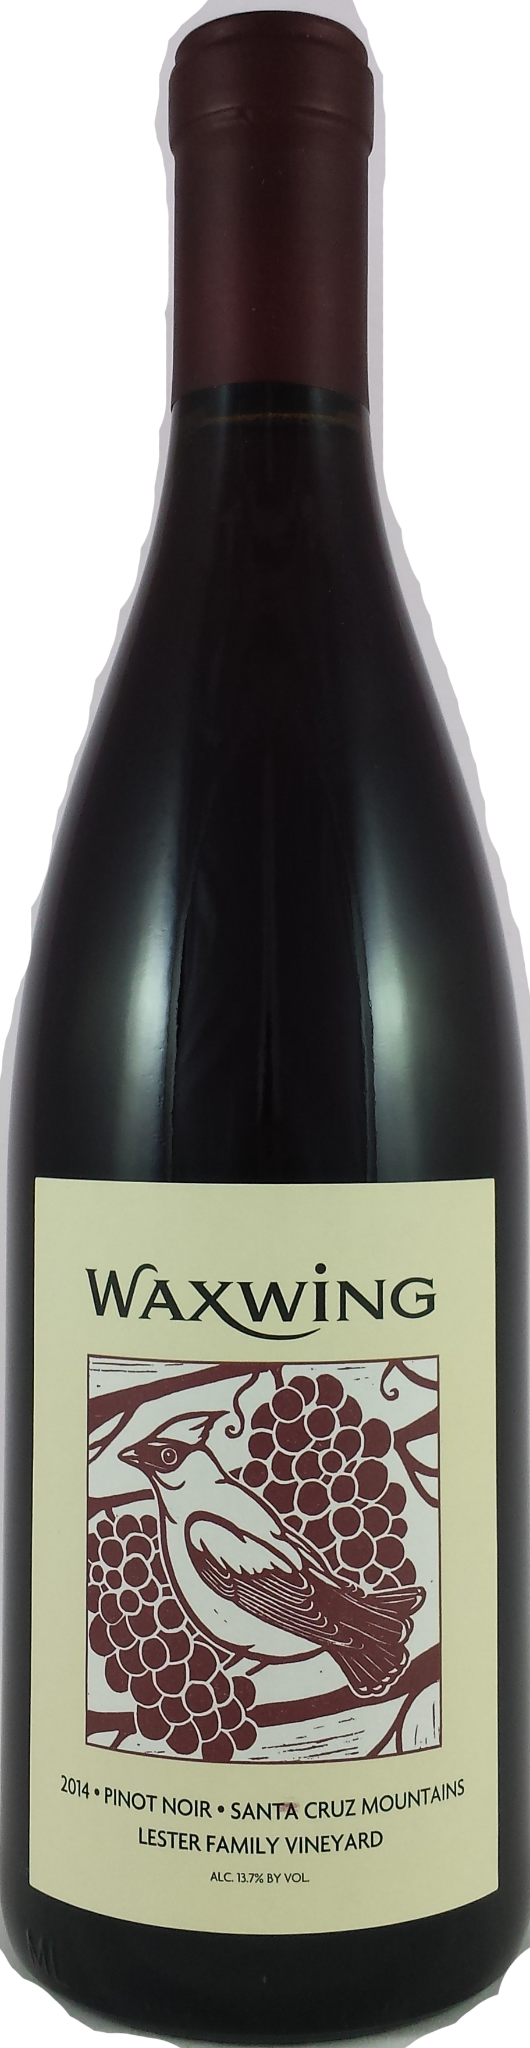 waxwing-lester-pn-2014-bottle1-1-1-1